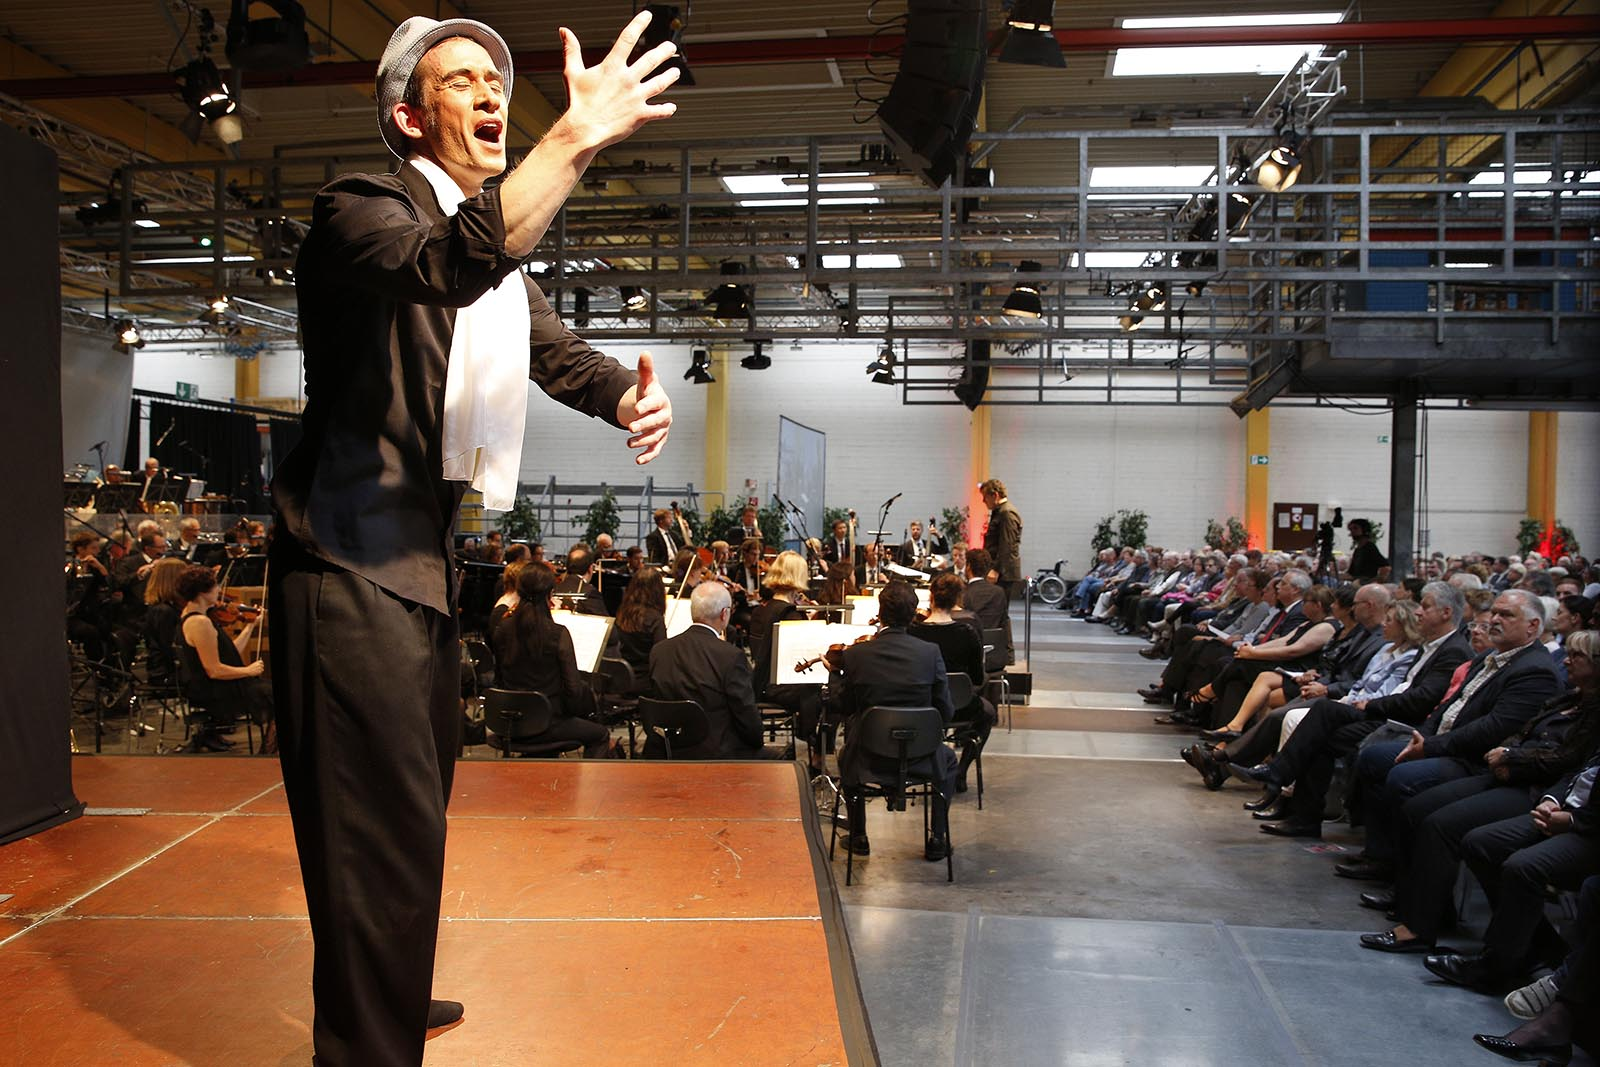 18. Werkstattkonzert der Bochumer Symphoniker bei der Bogestra am Standort Bochum Riemke, Herner Str. 299. Bochum, 13. September 2015